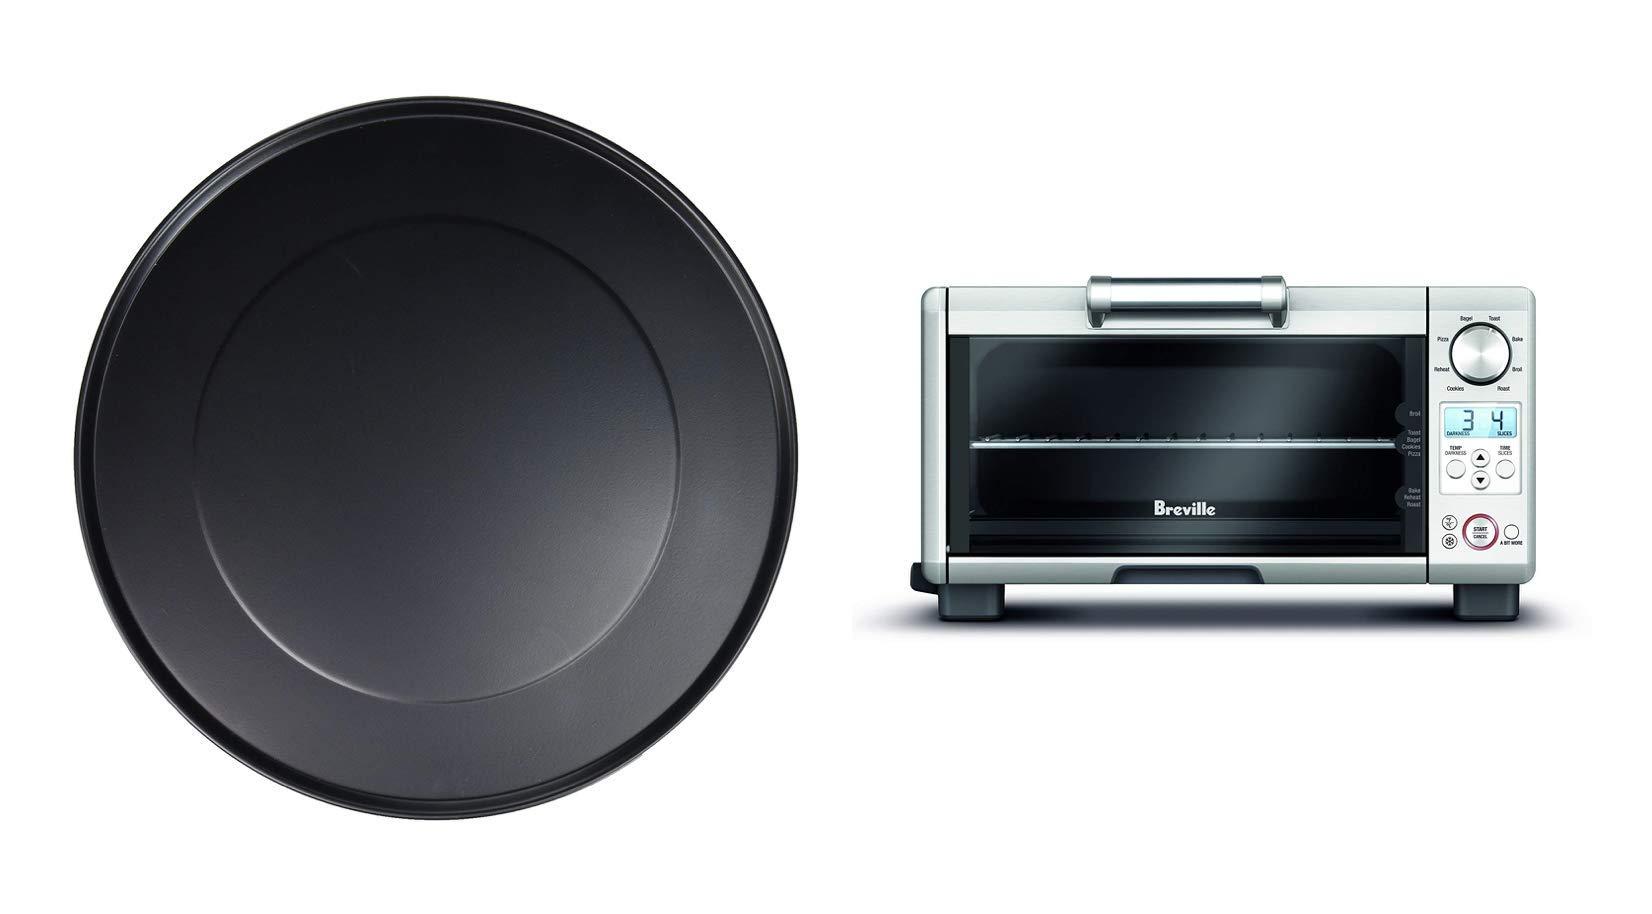 Breville the Mini Smart Oven BOV450XL with 11-inch Non-Stick Pizza Pan, Bundle